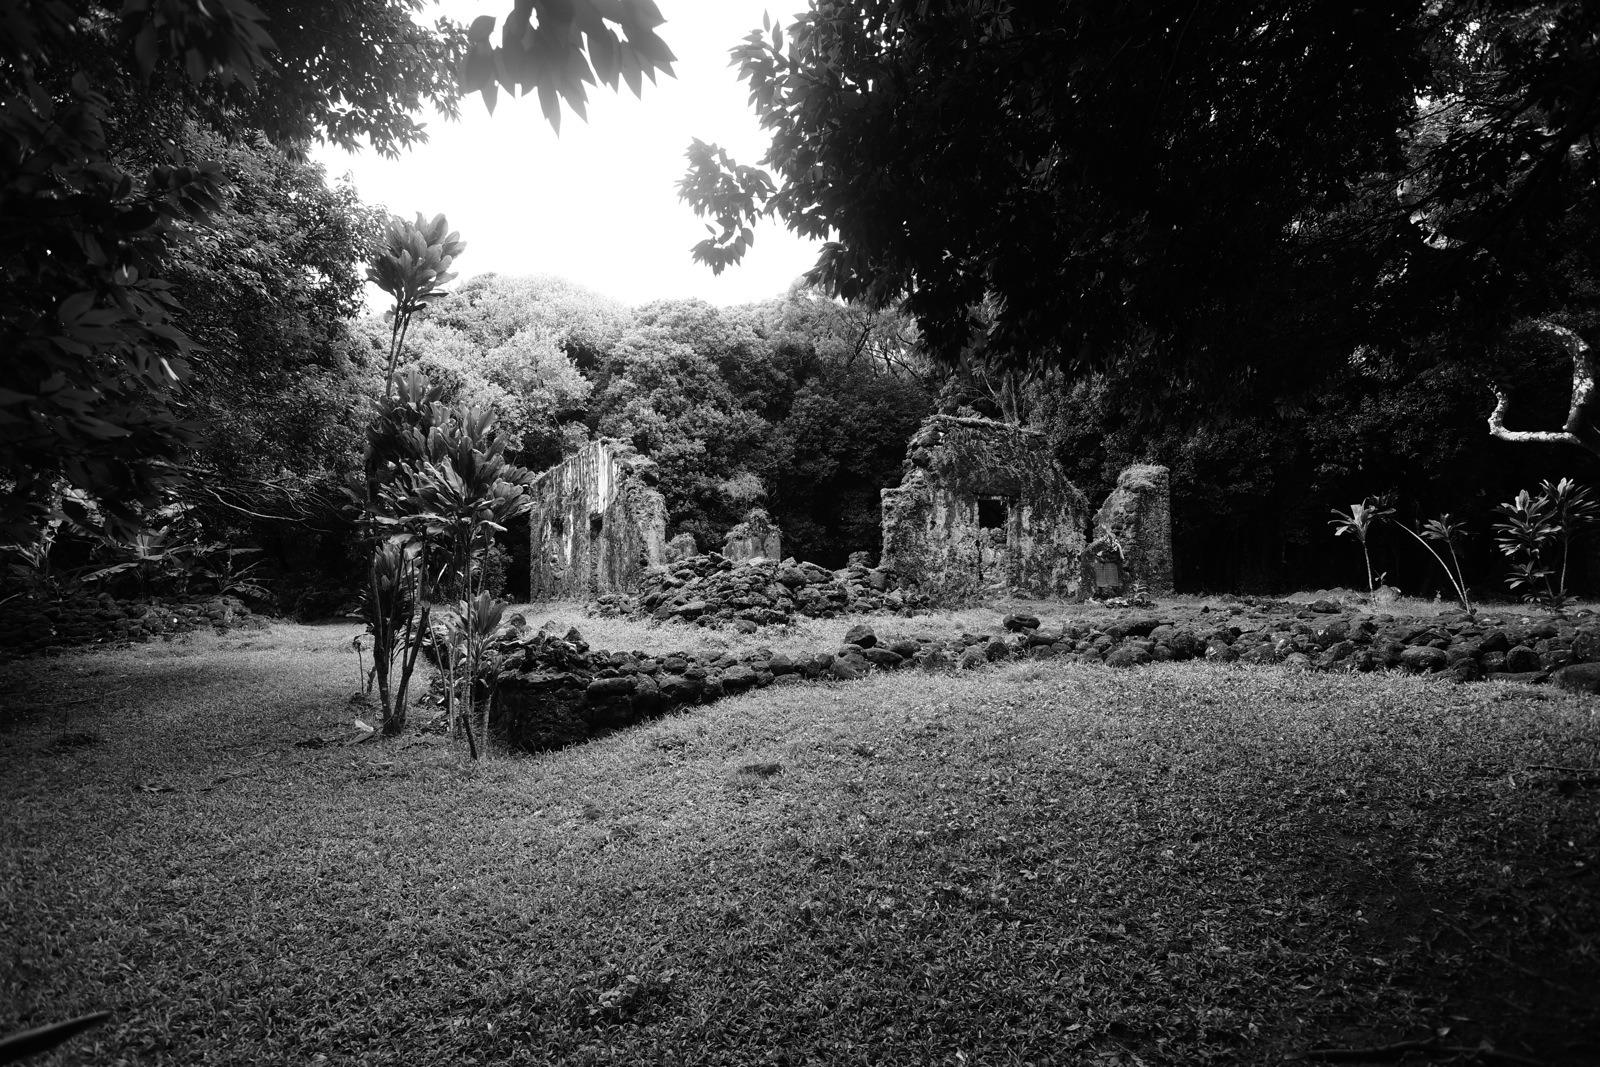 Kaniakapupu -- Summer palace of King Kamehameha III